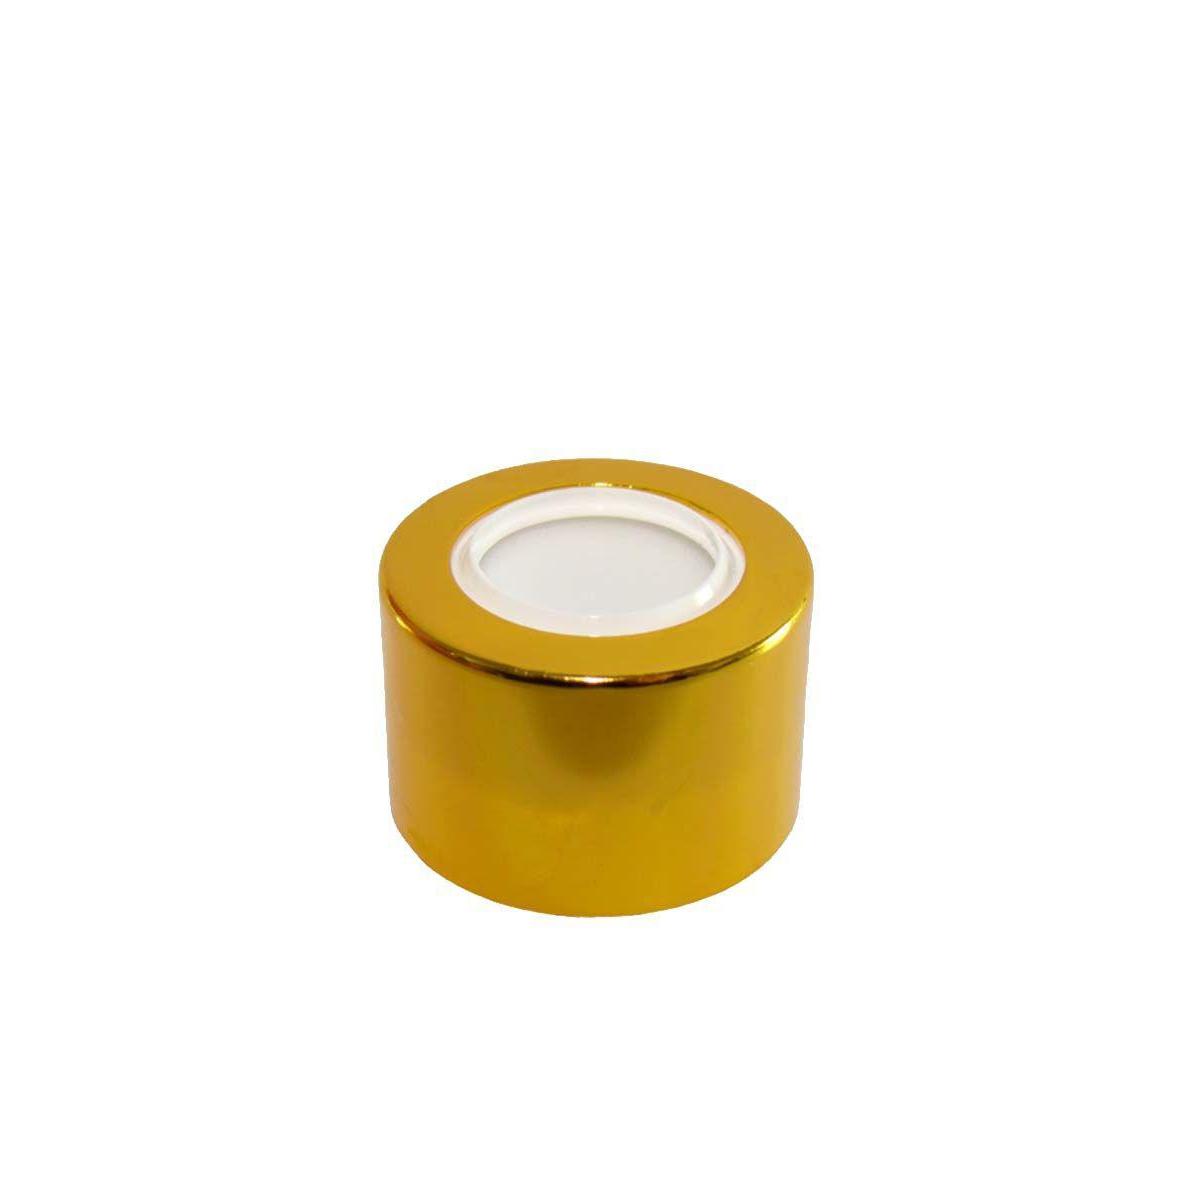 Tampa Difusora Luxo 20/410 Cromada Dourada